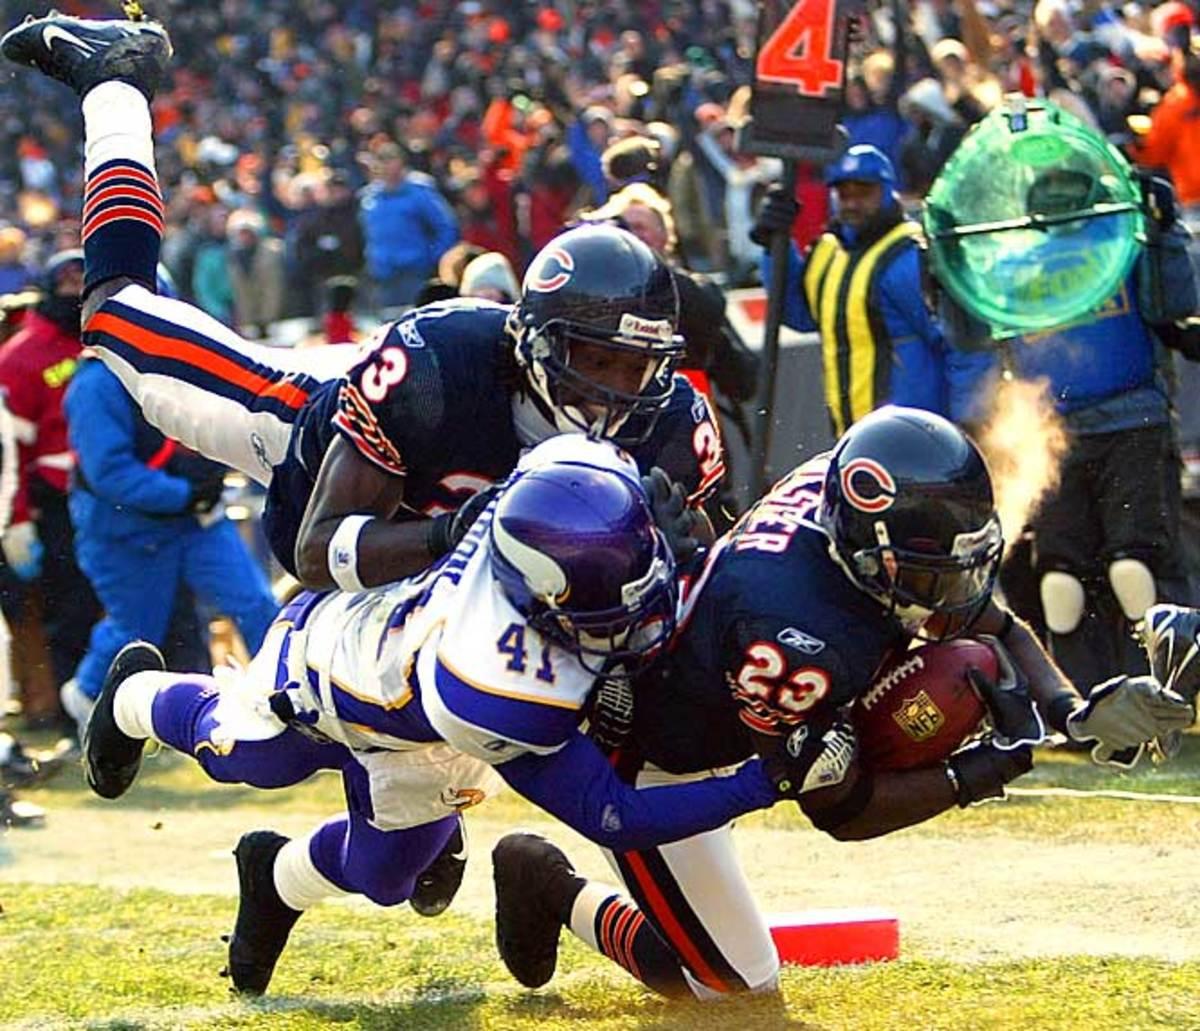 Bears 23, Vikings 13